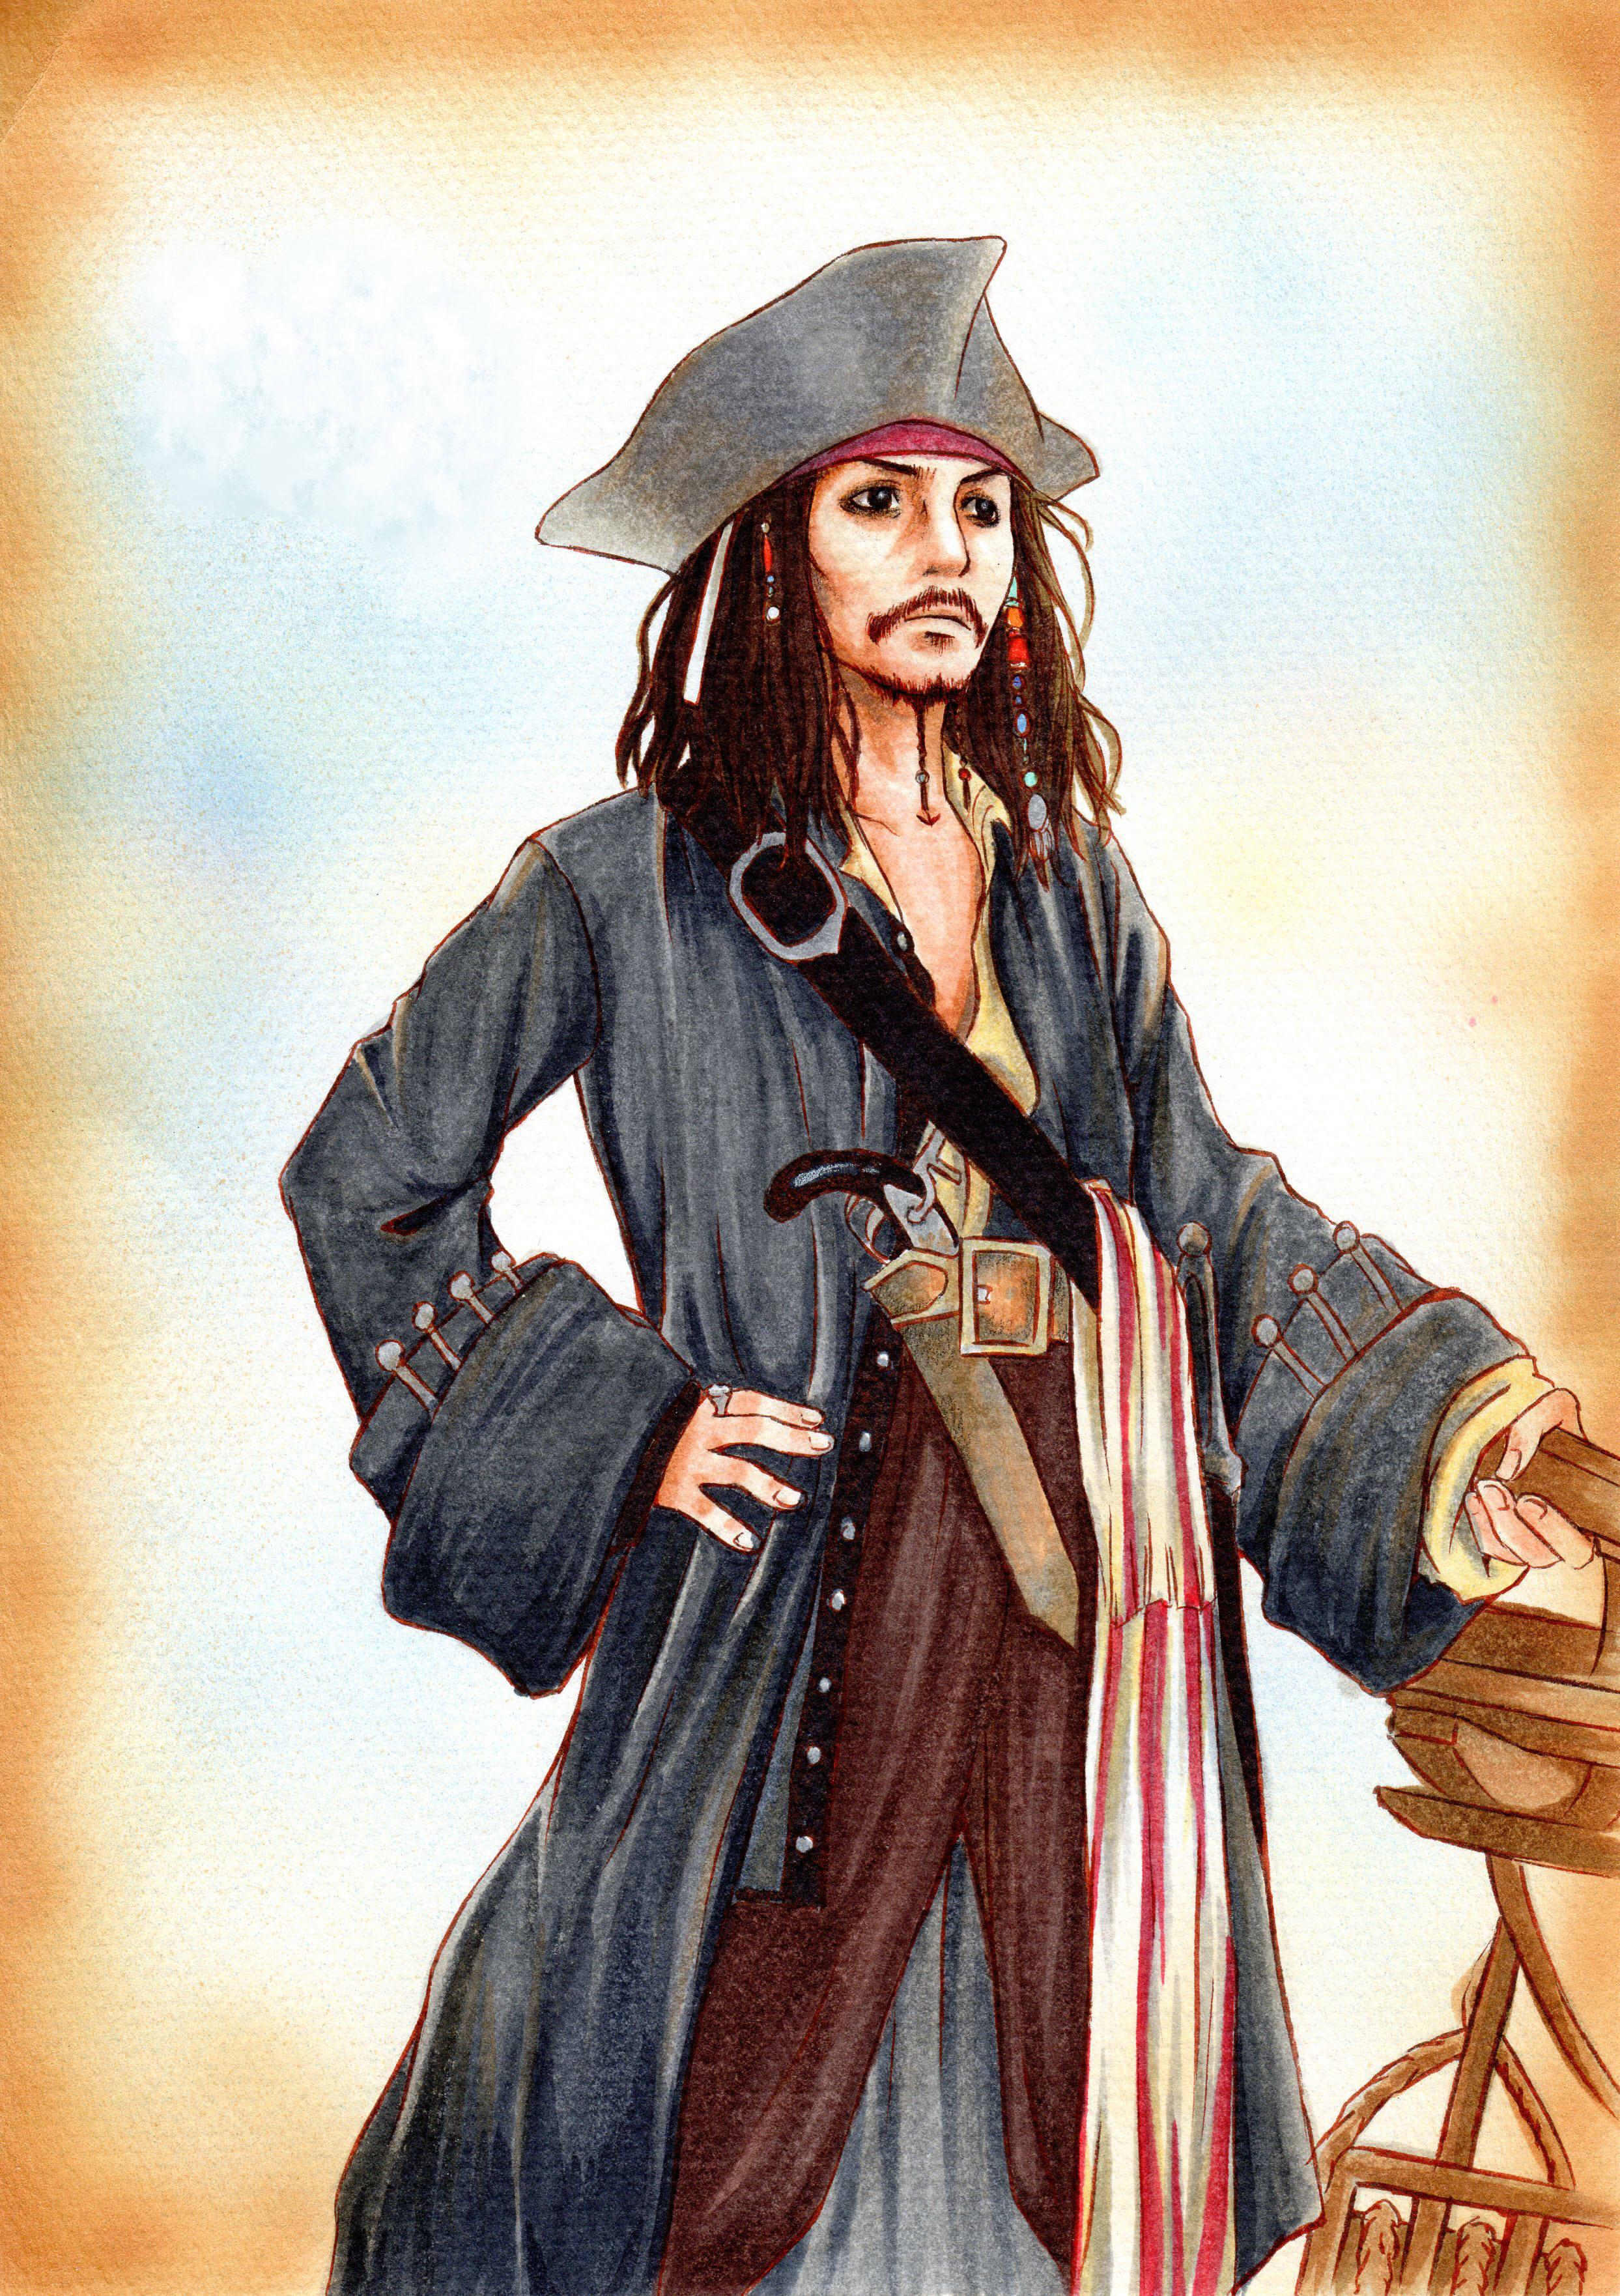 Jack sparrow pirates of the caribbean zerochan anime - Anime pirate wallpaper ...